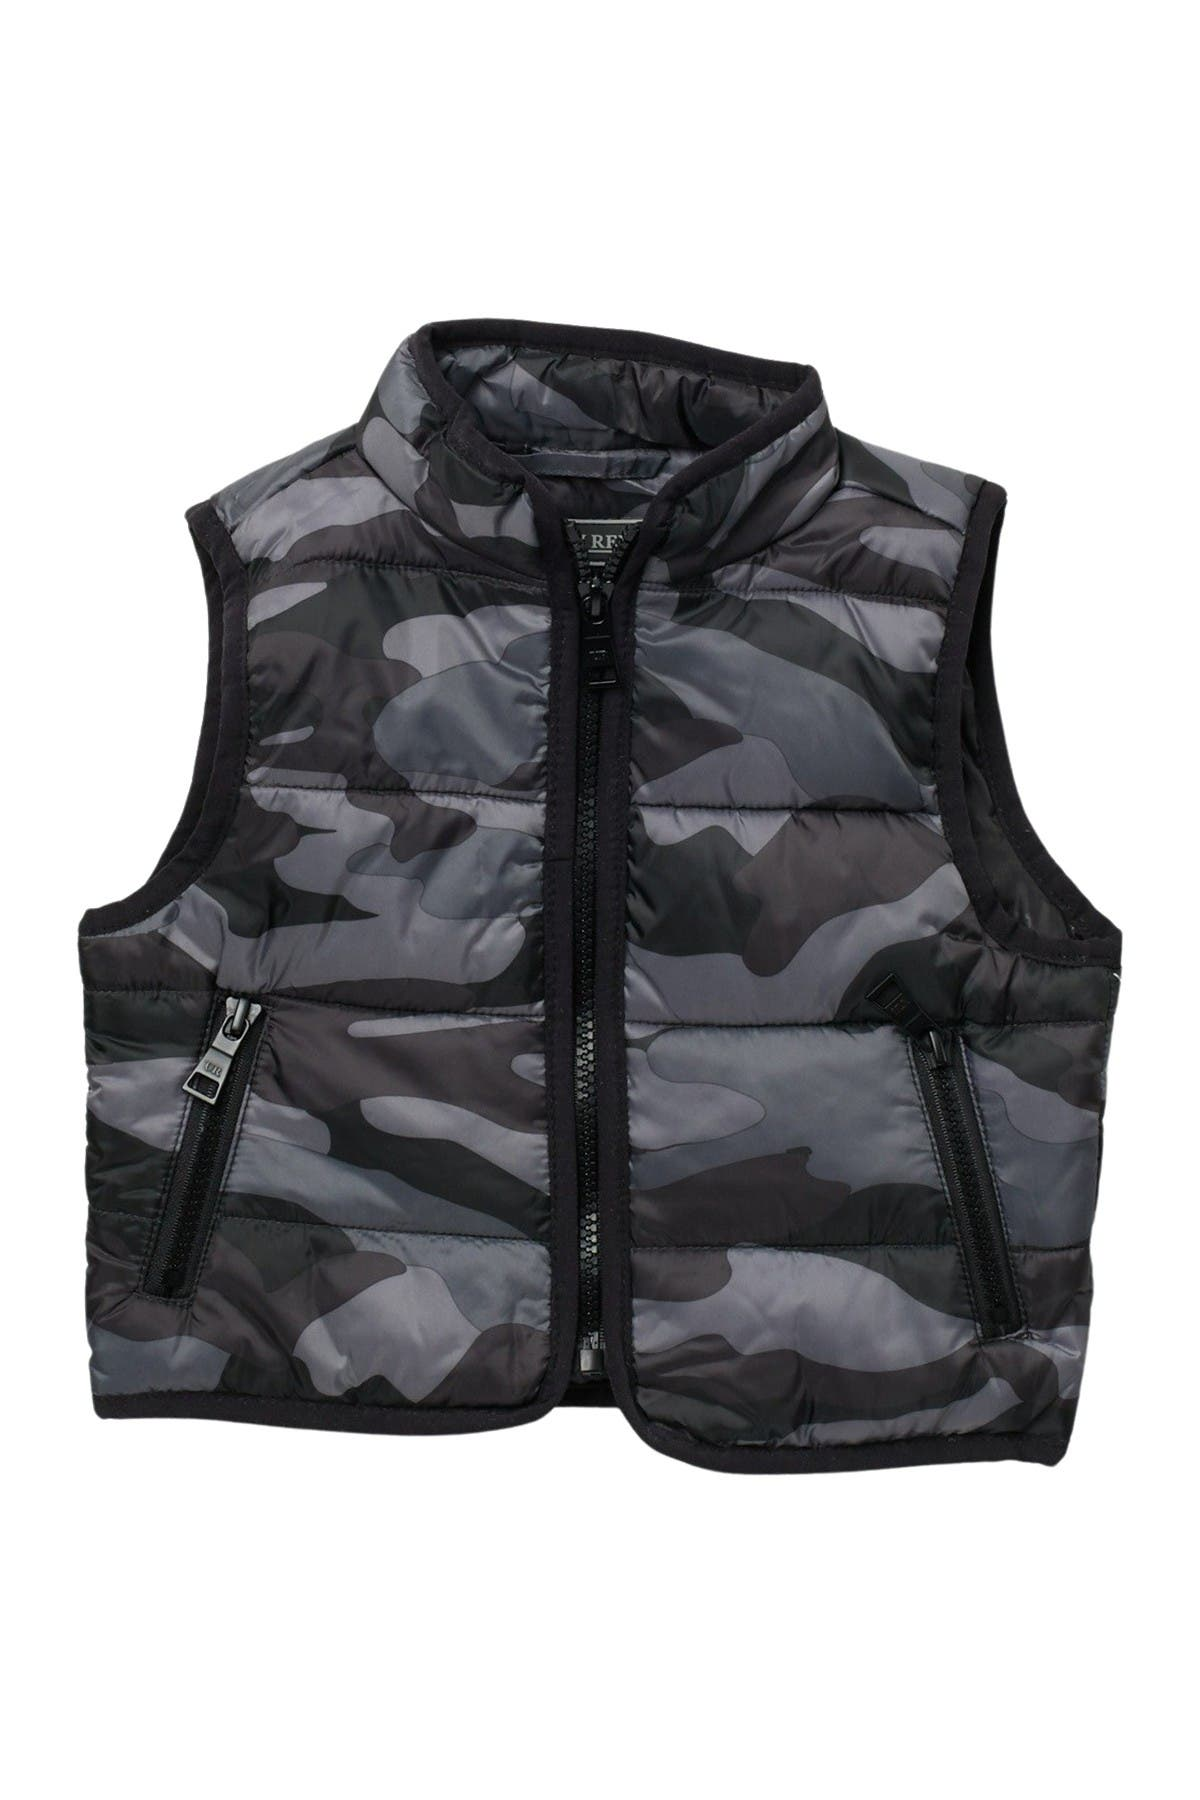 Image of Urban Republic Camo Print Reversible Puffer Vest